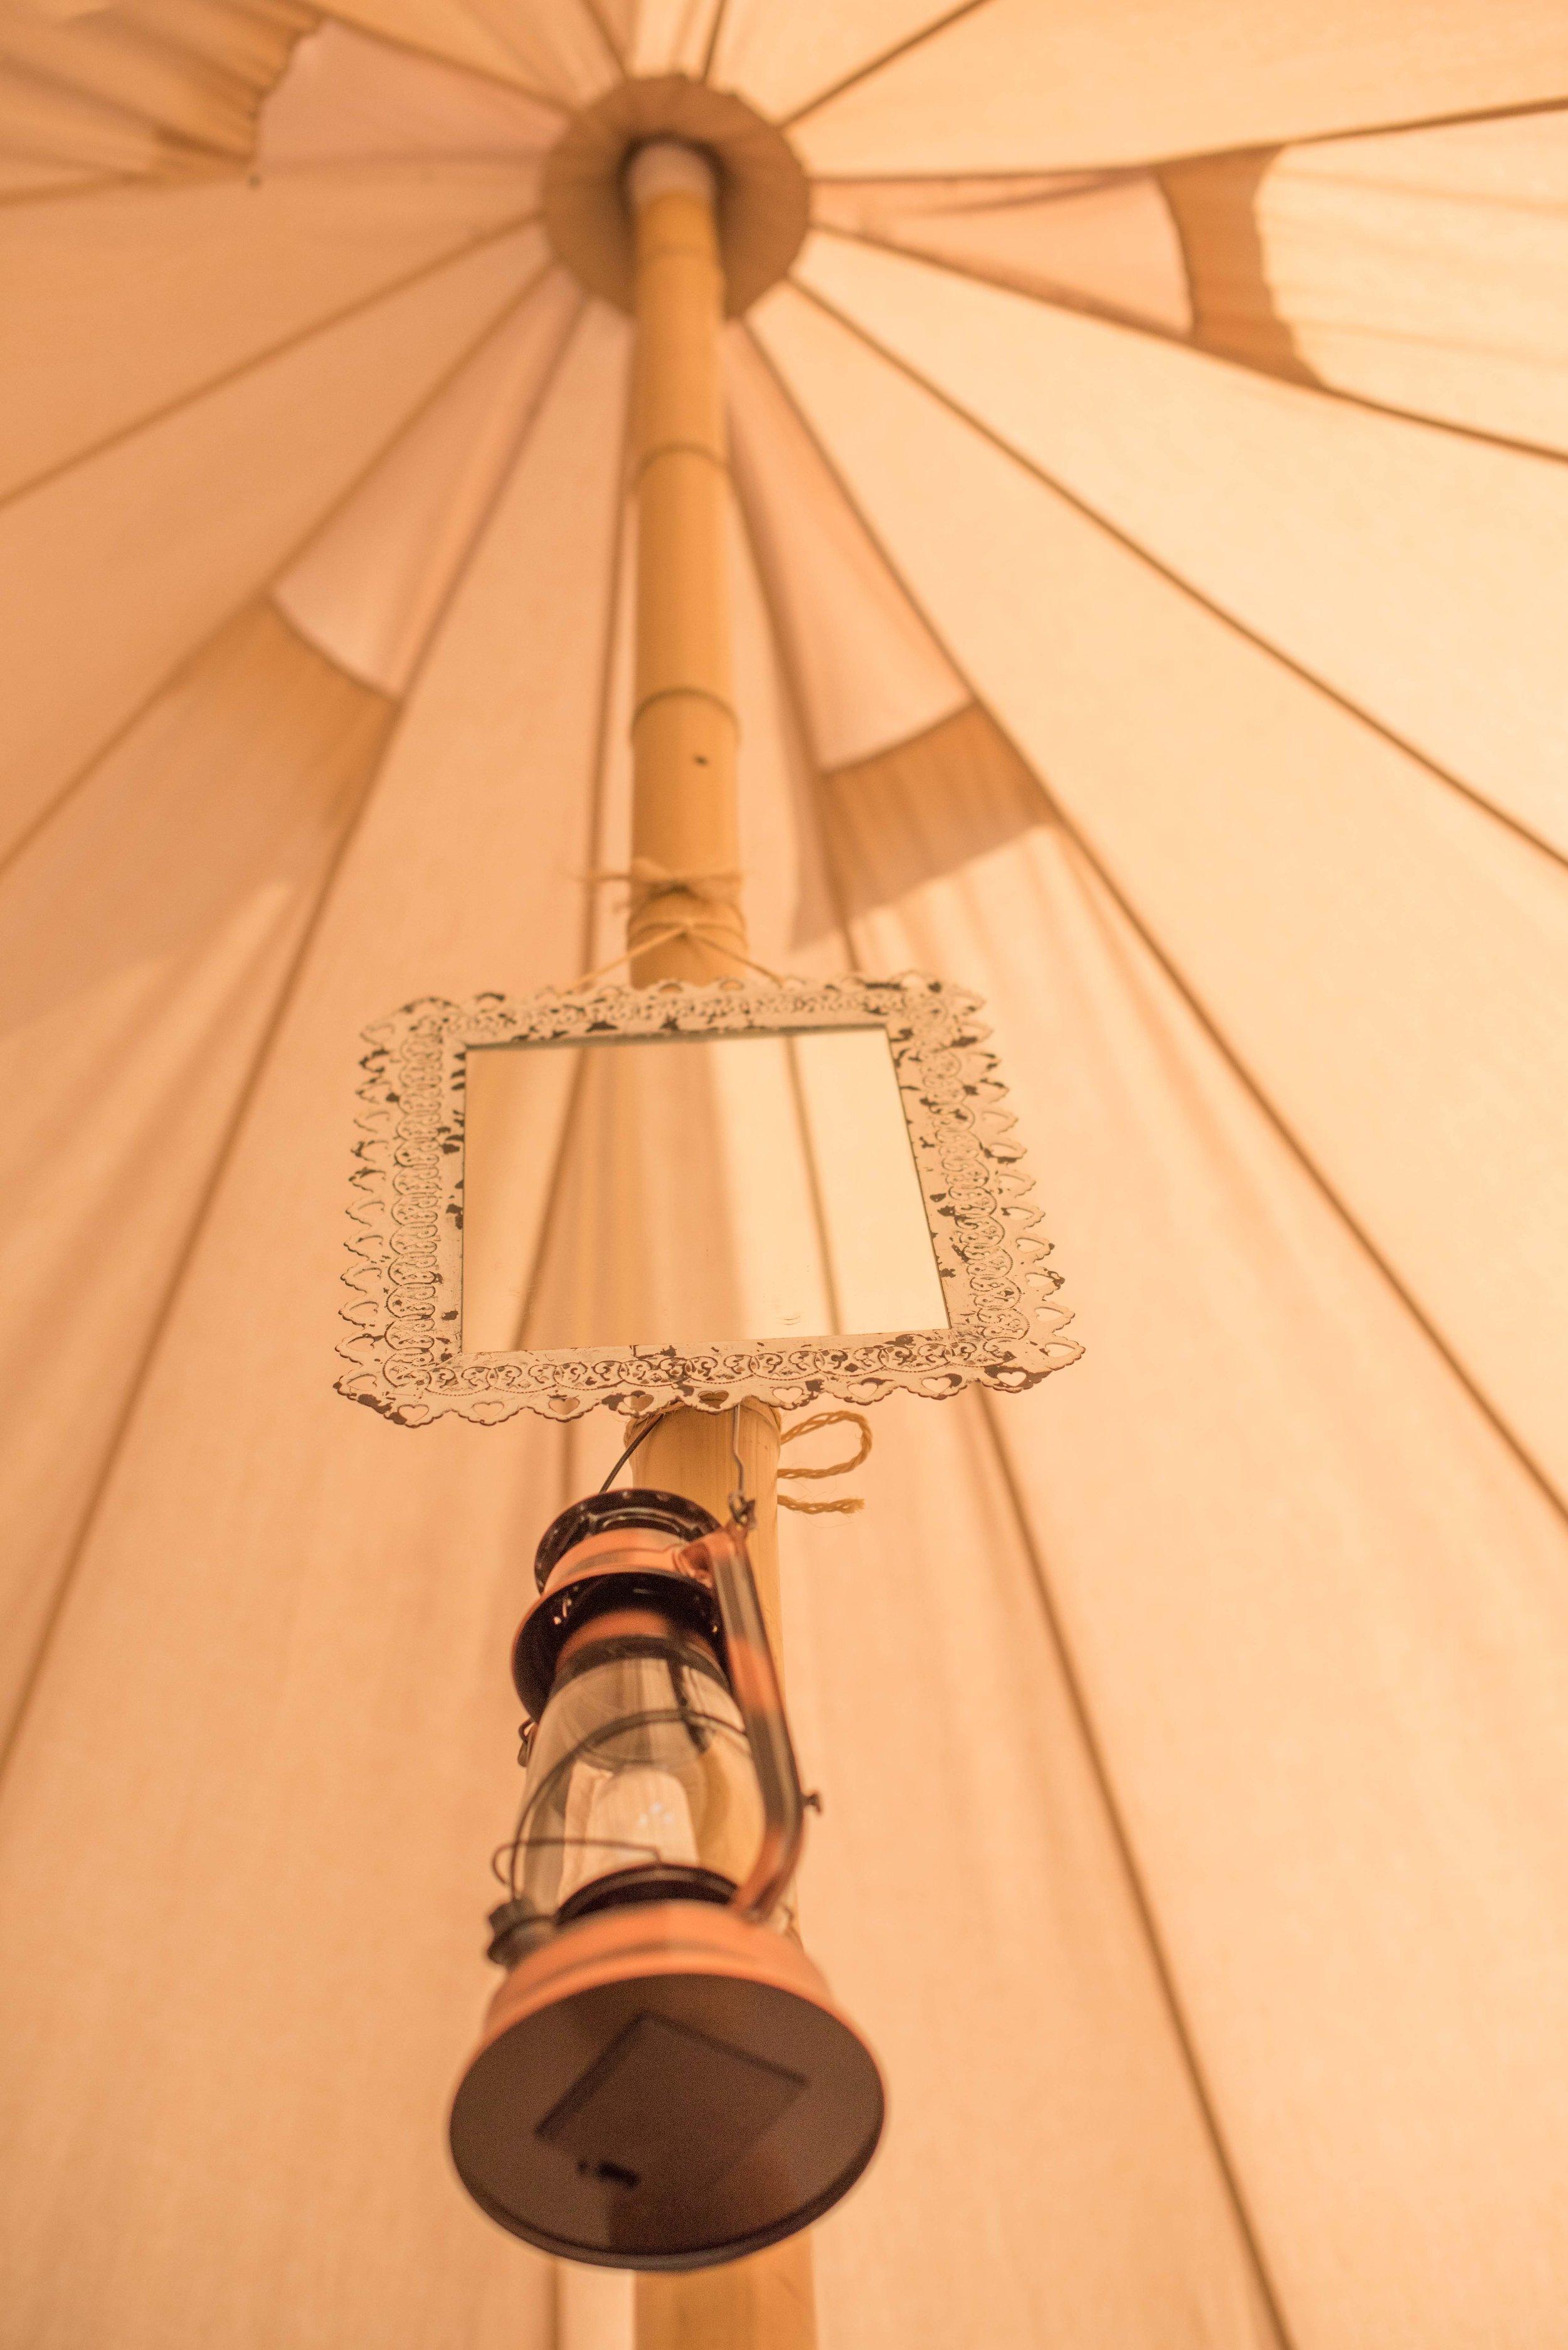 hotel_bell_tent_lf-lantern_mirror.jpg